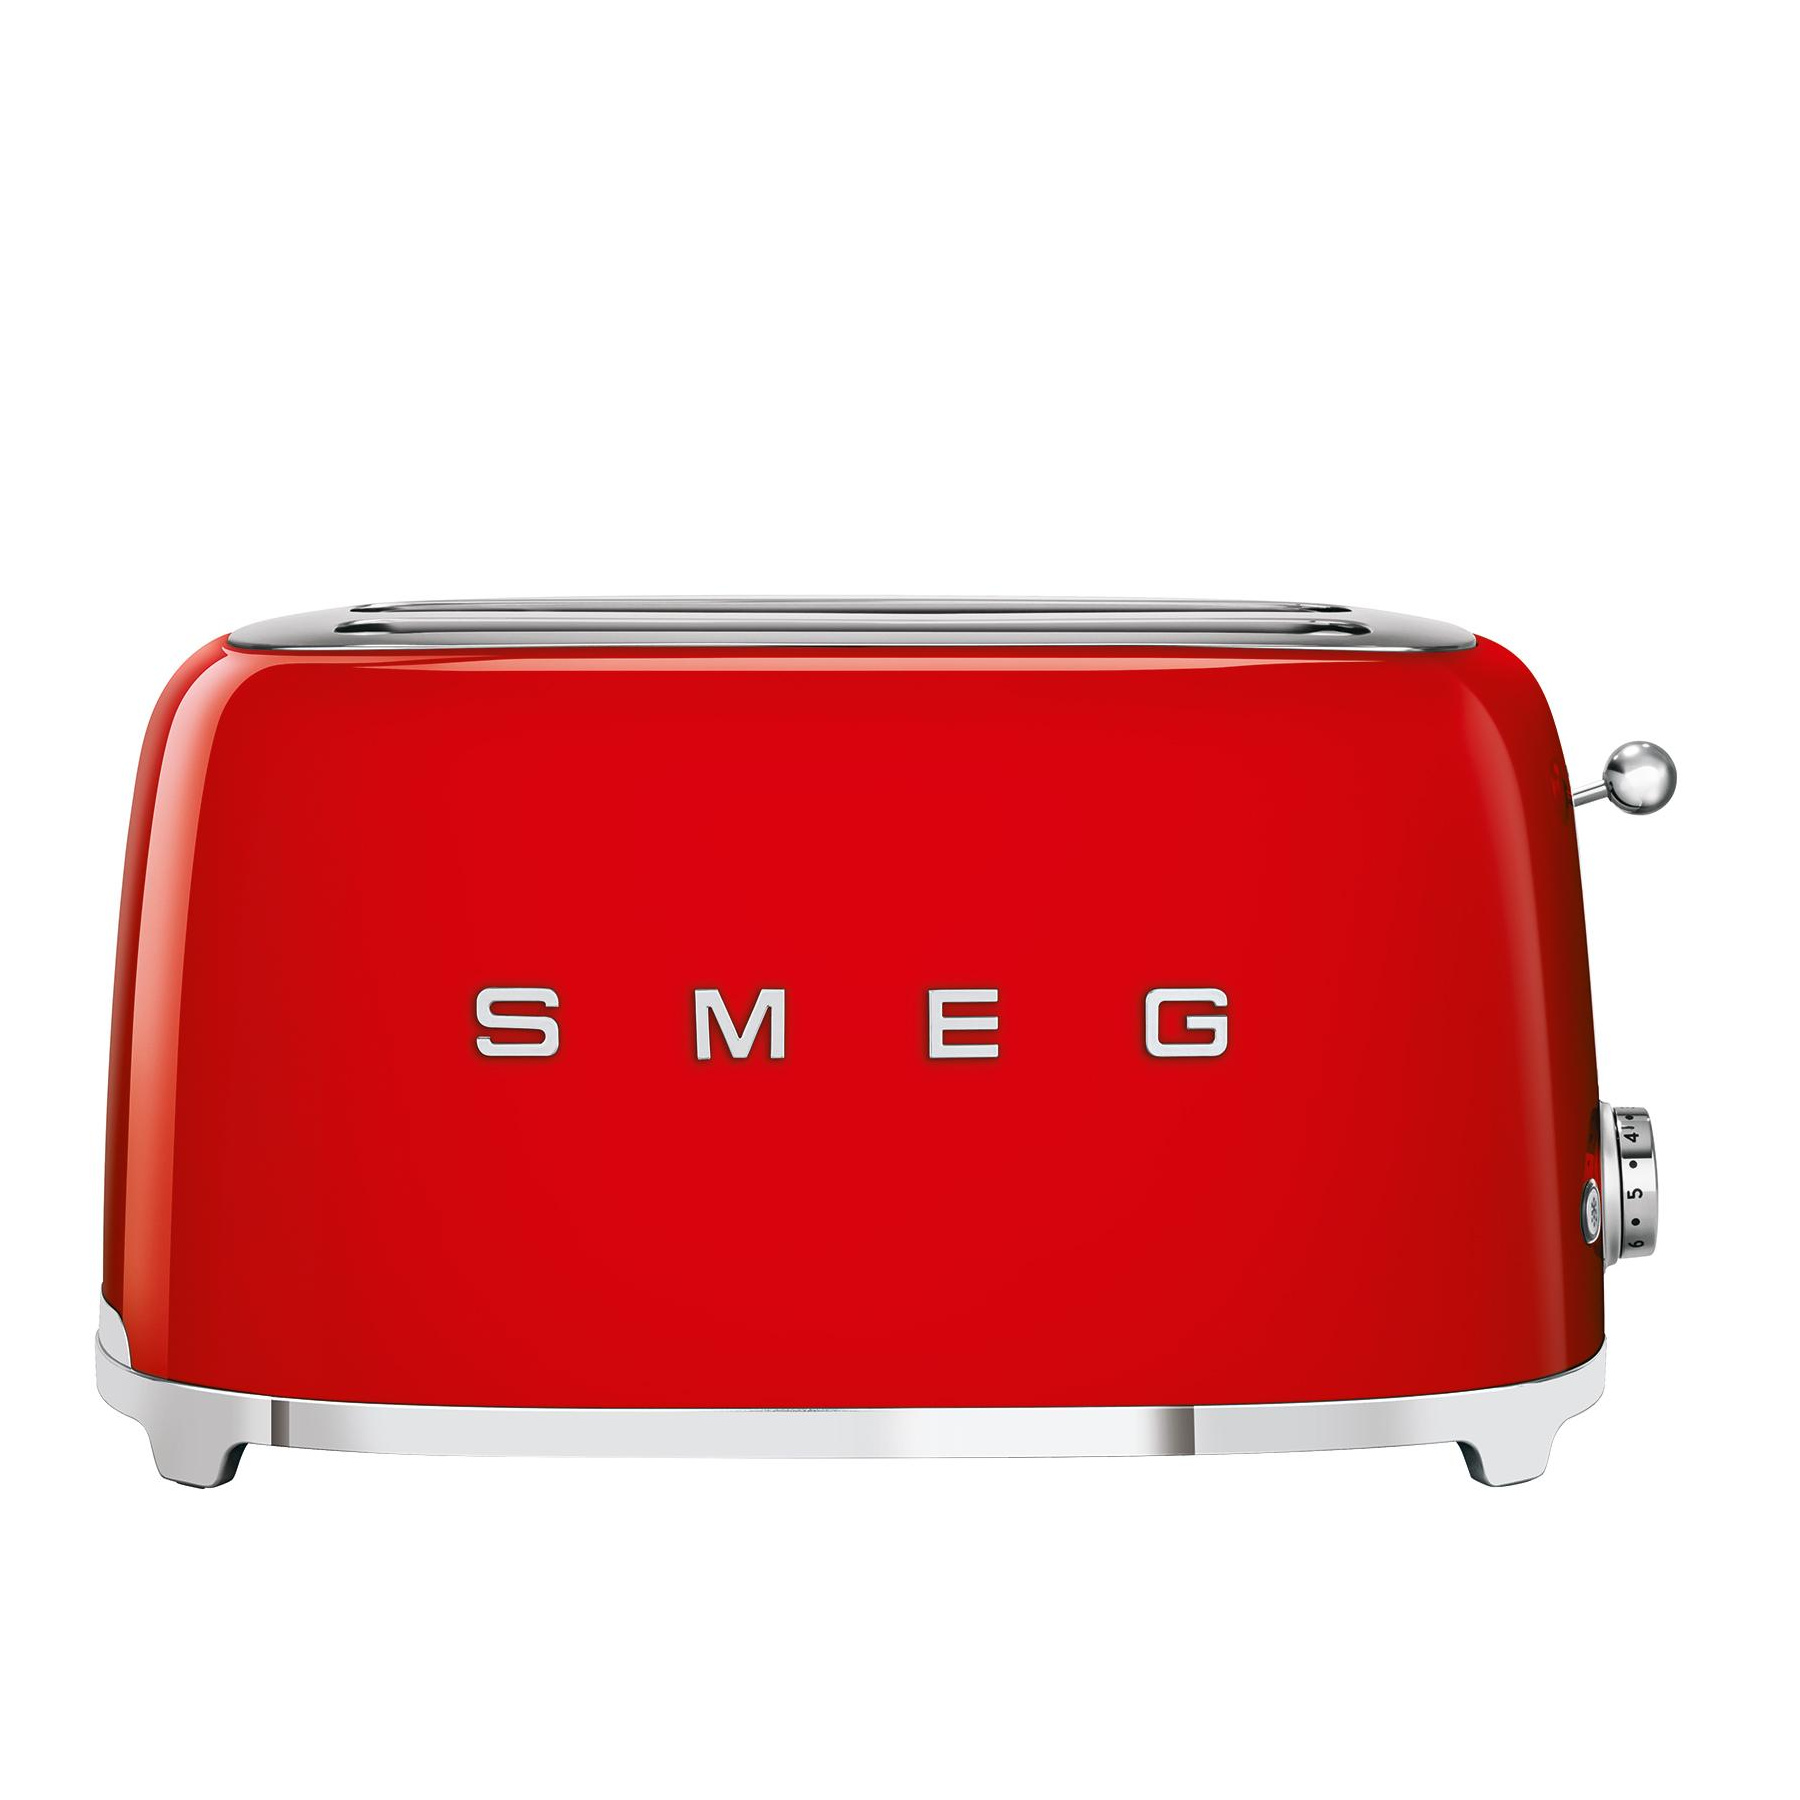 rot glänzend Grundig Toaster TA 4620 R